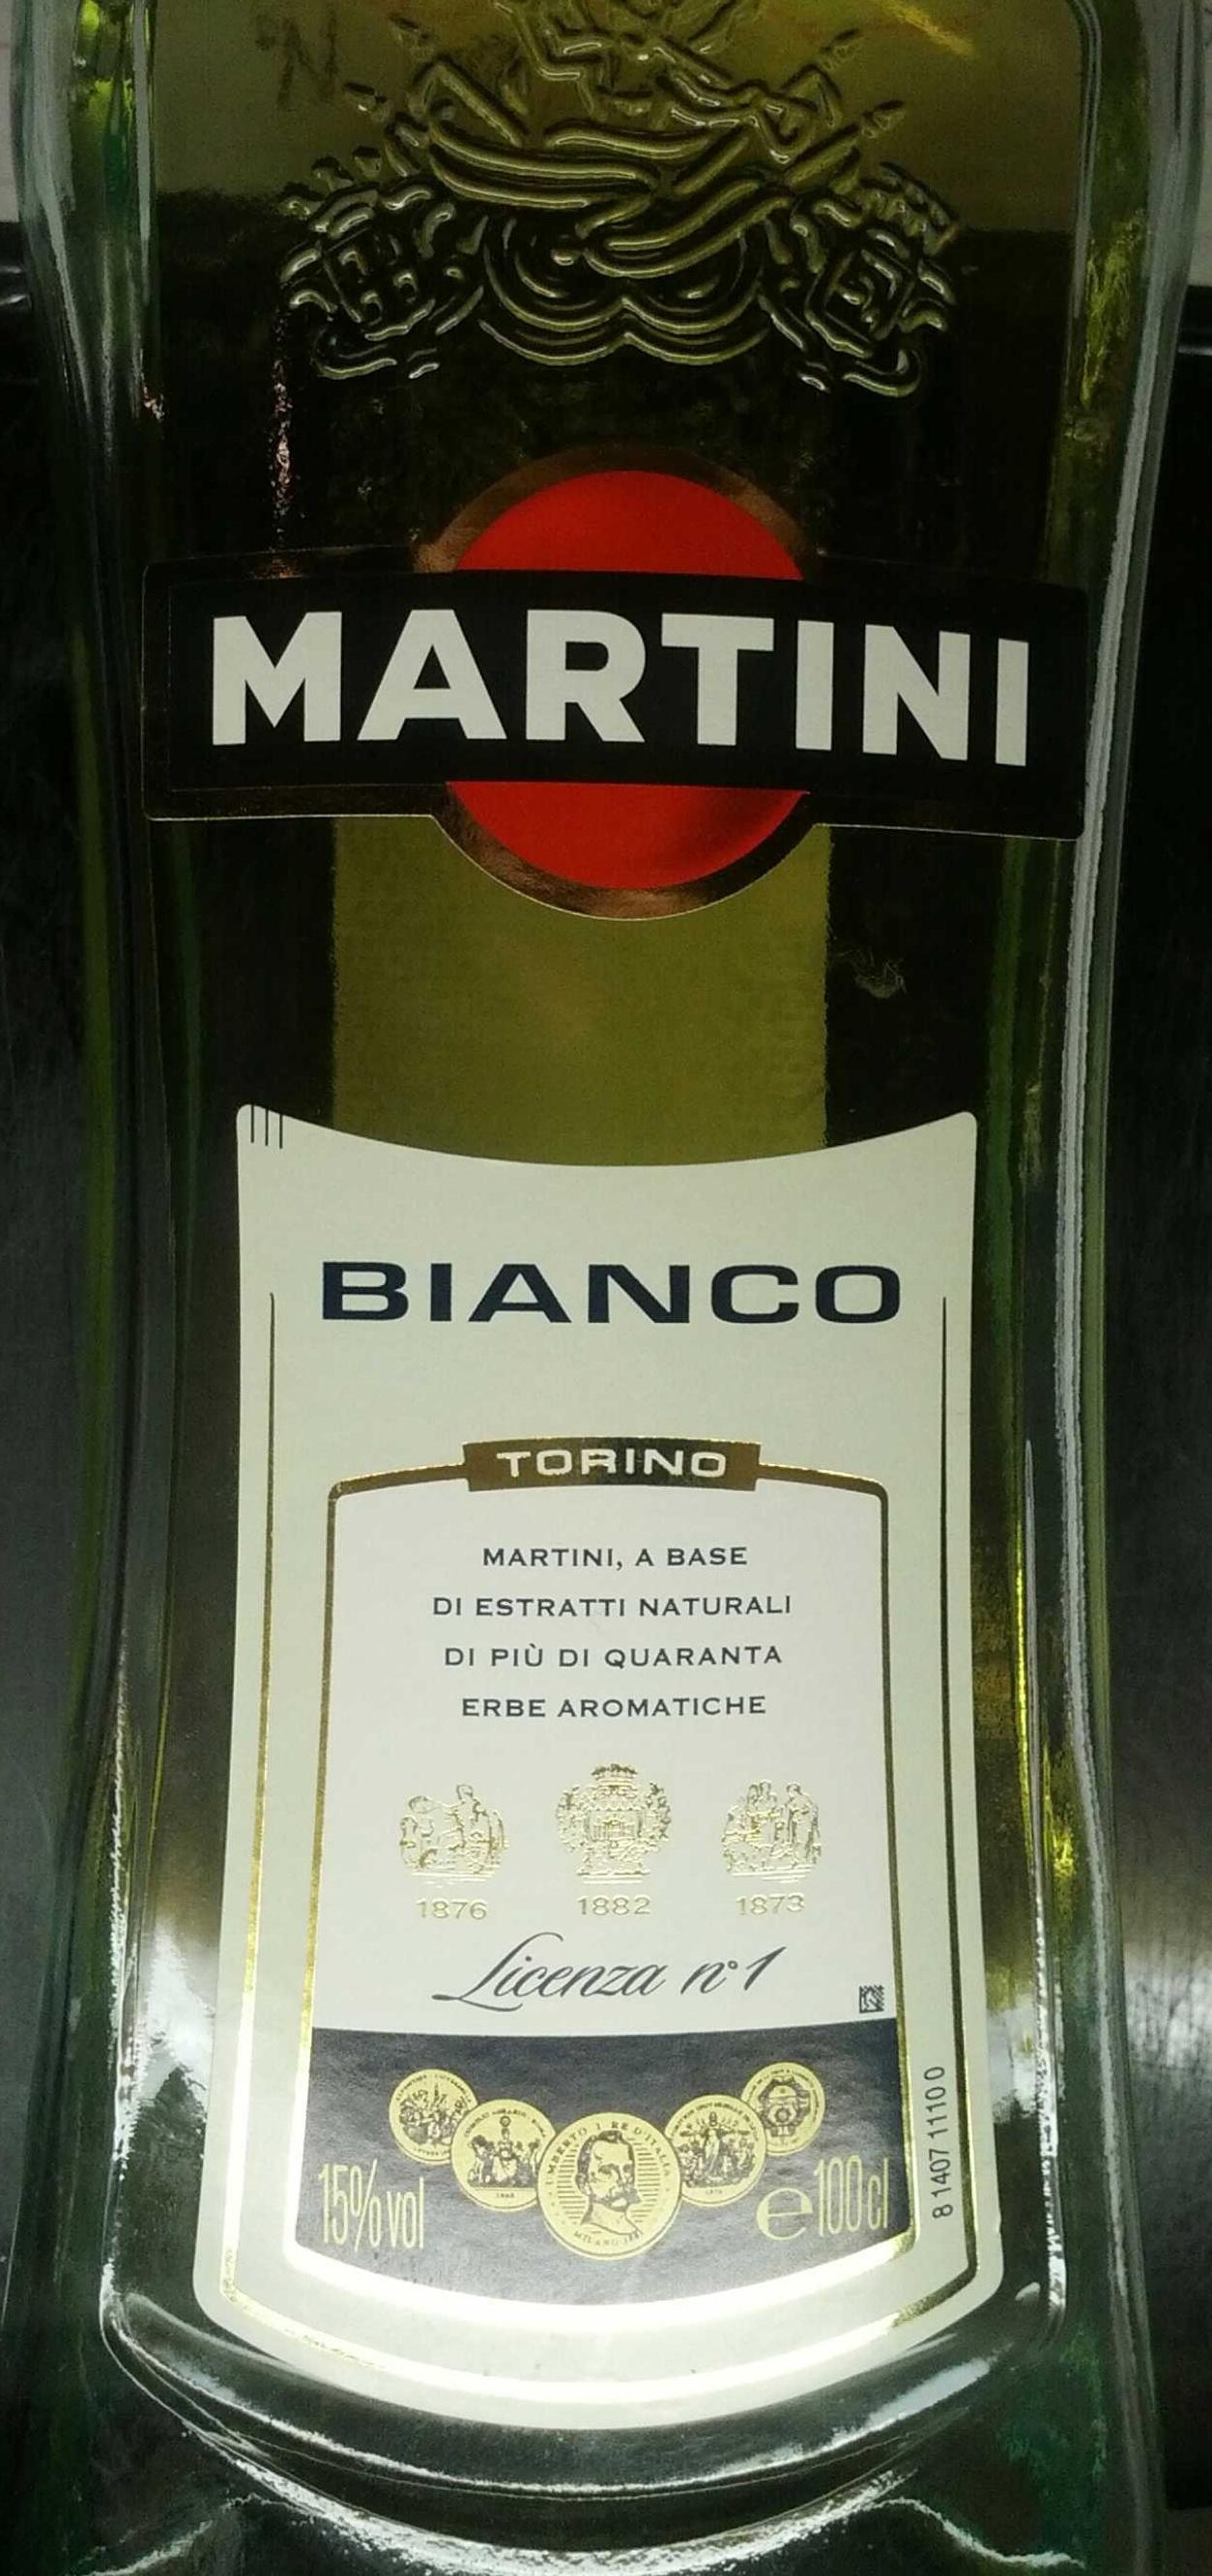 Drinks torino martini bianco How to